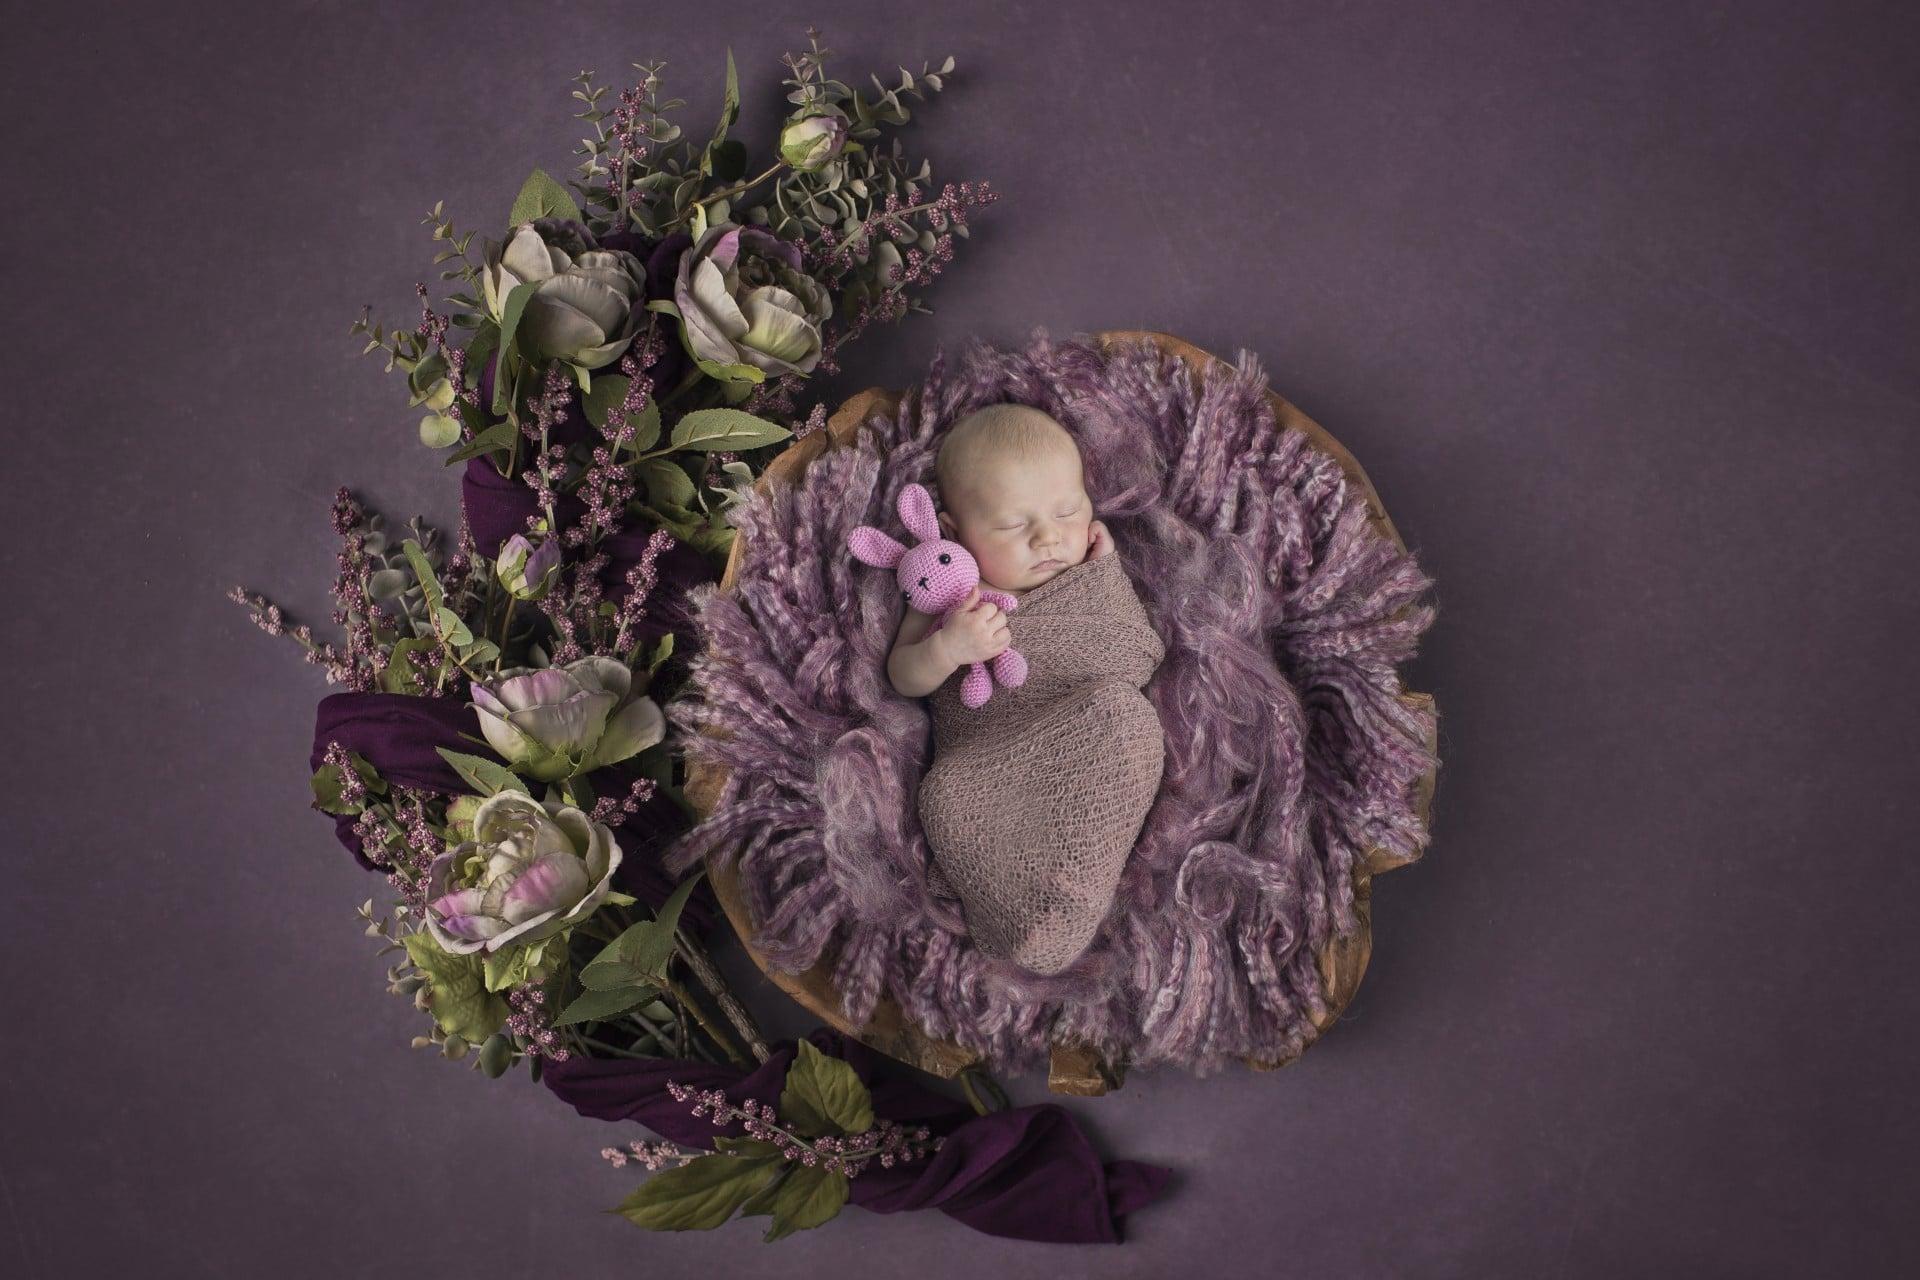 133-Tania-Flores-Photography-Babyfotos-FInzkatK